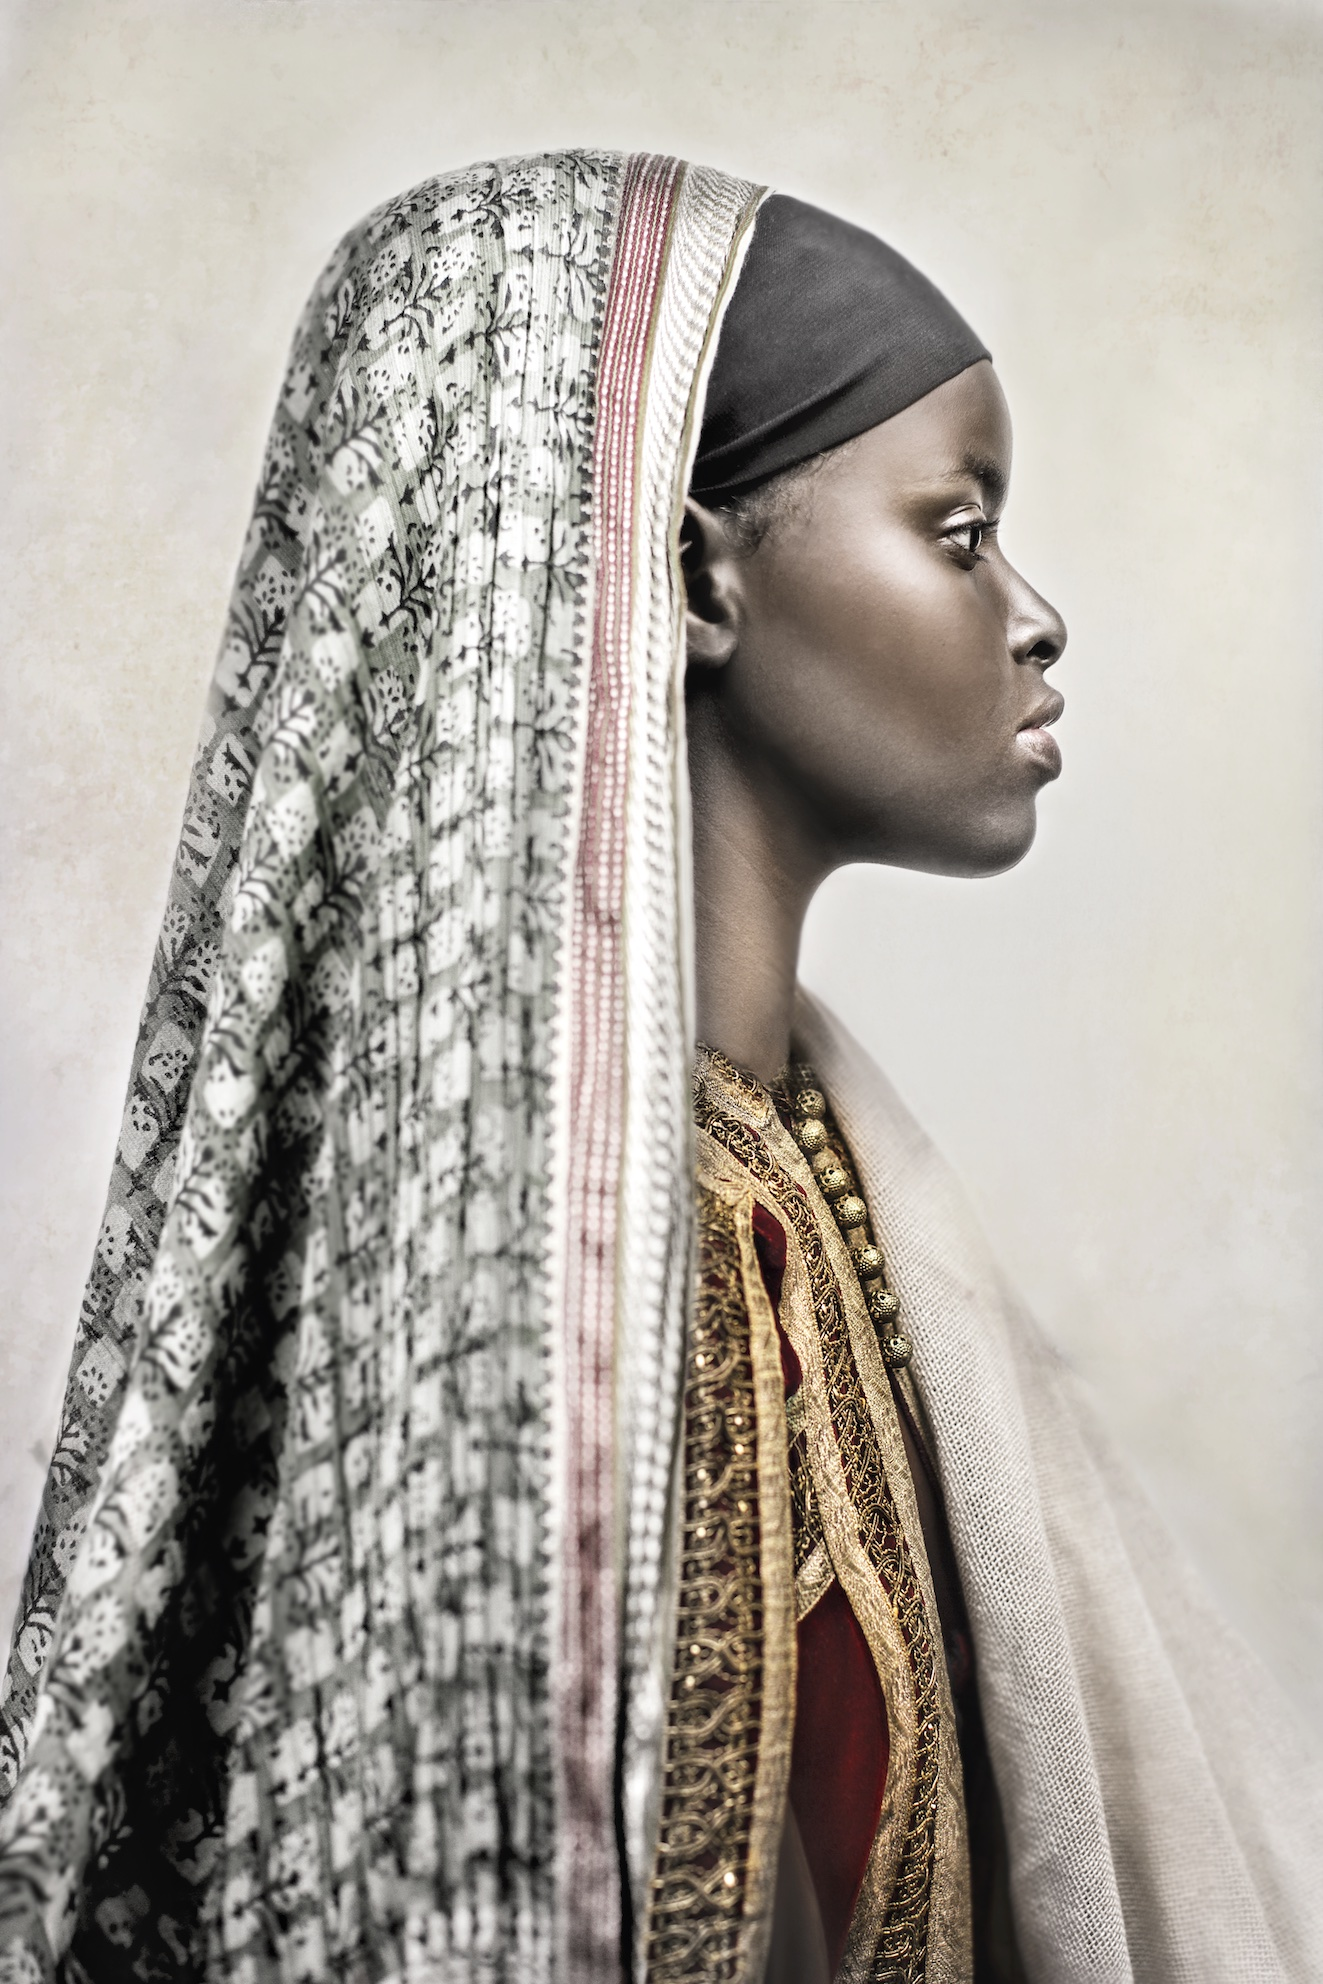 foto: Dagmar van Weeghel - Diaspora